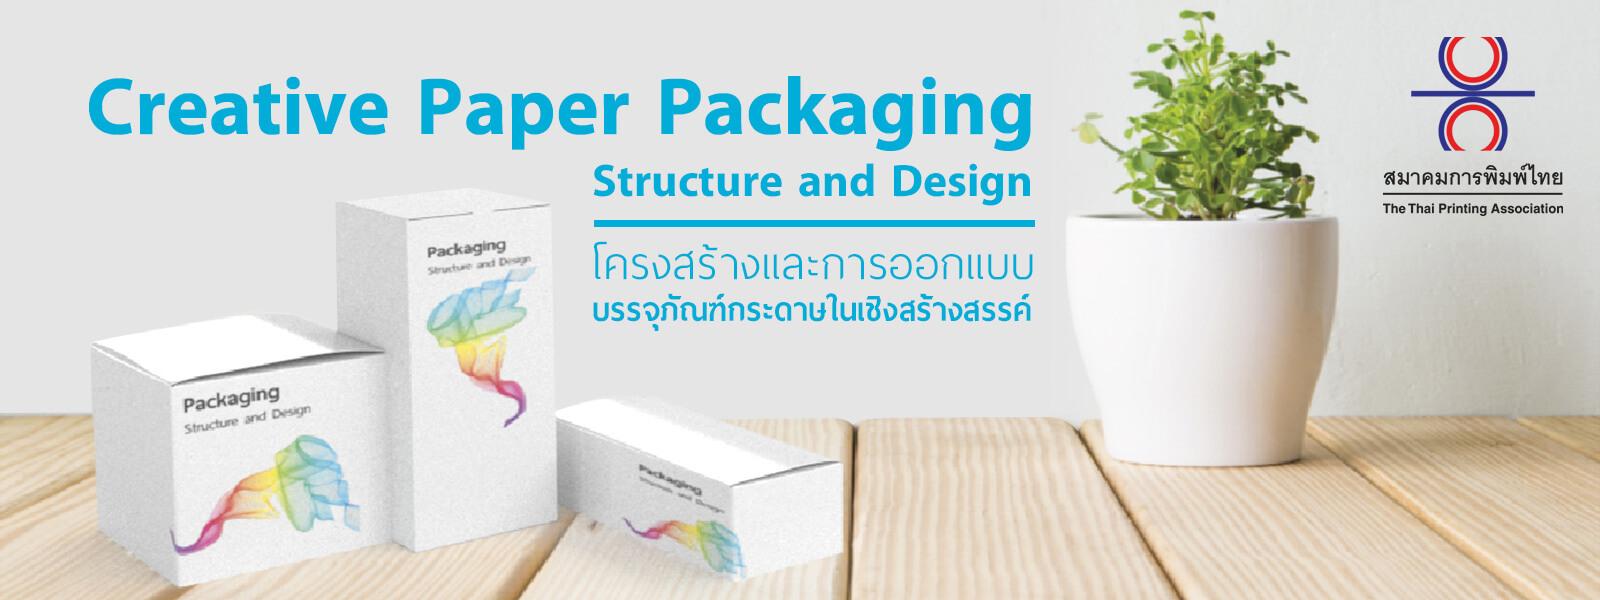 20180604_creative-paper-packaging-01